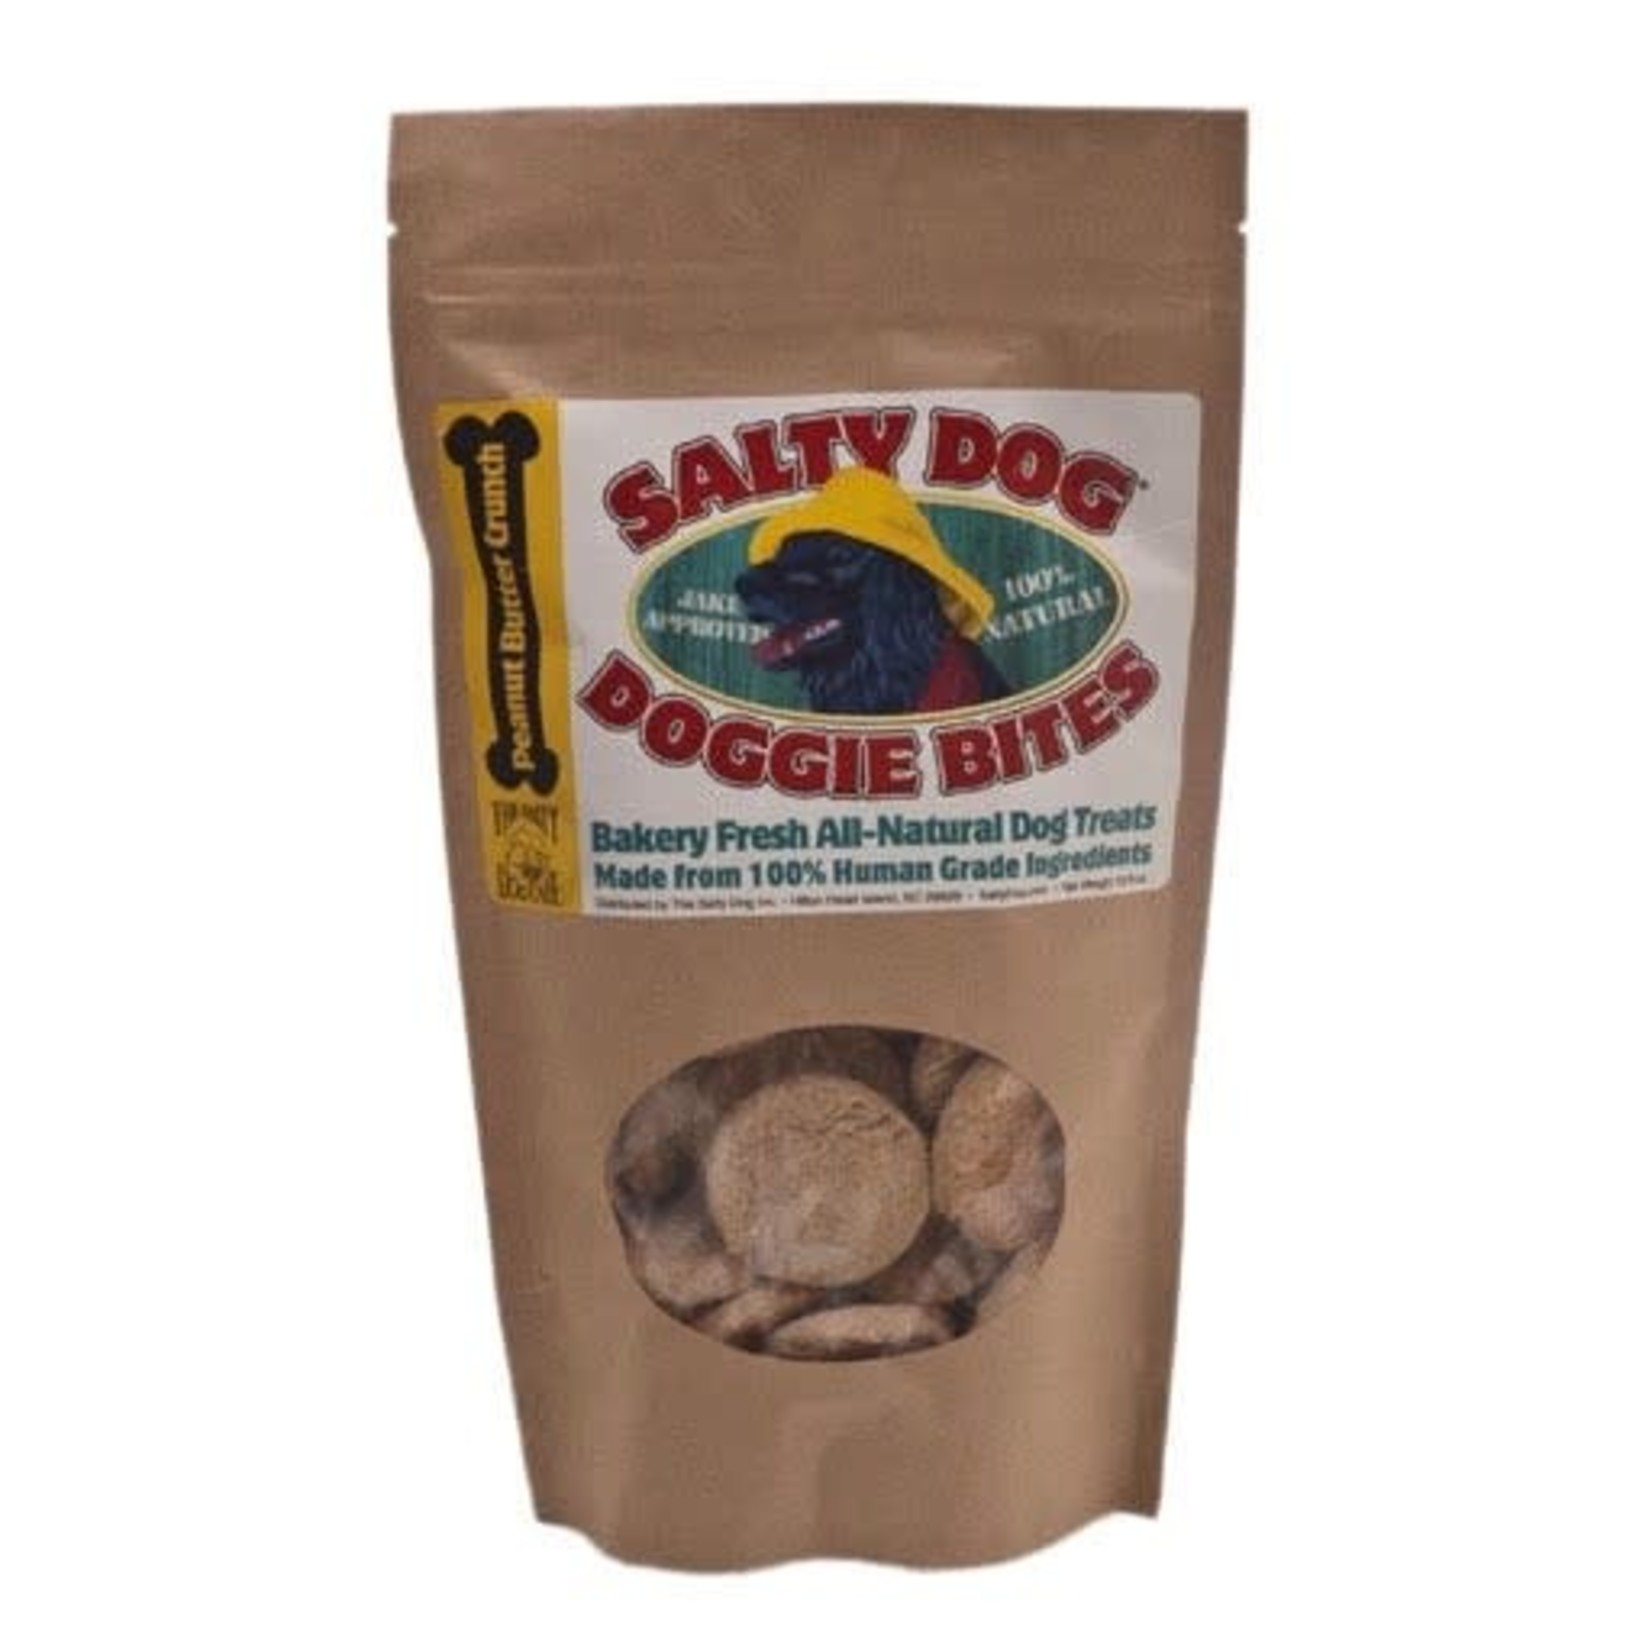 Doggie Bites - Peanut Butter - 10.5 oz